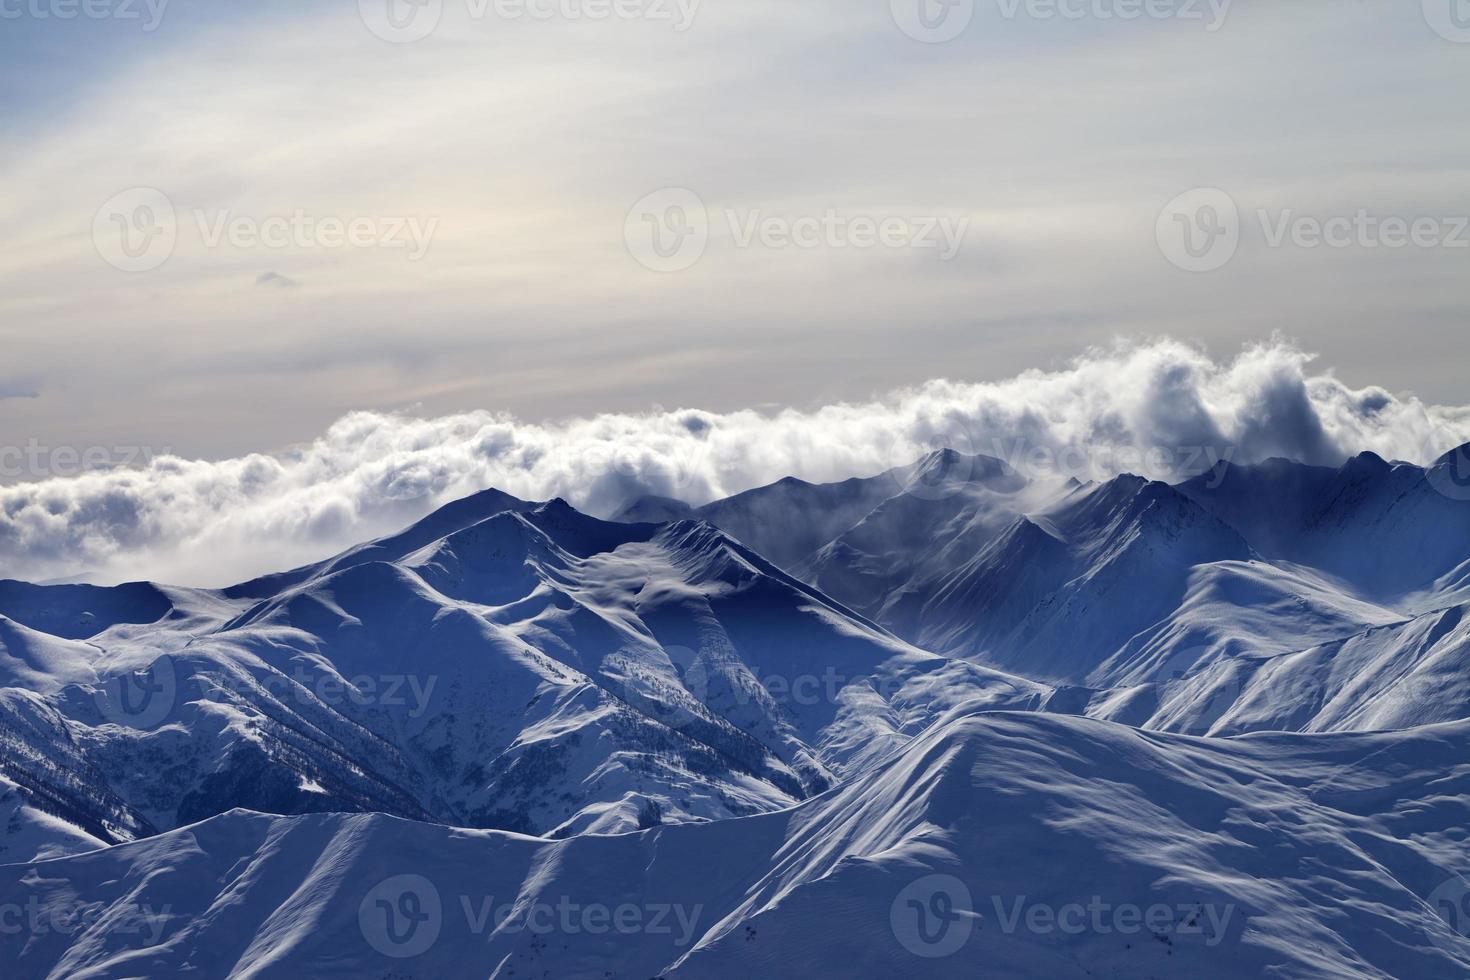 besneeuwde bergen in de mist op winteravond foto